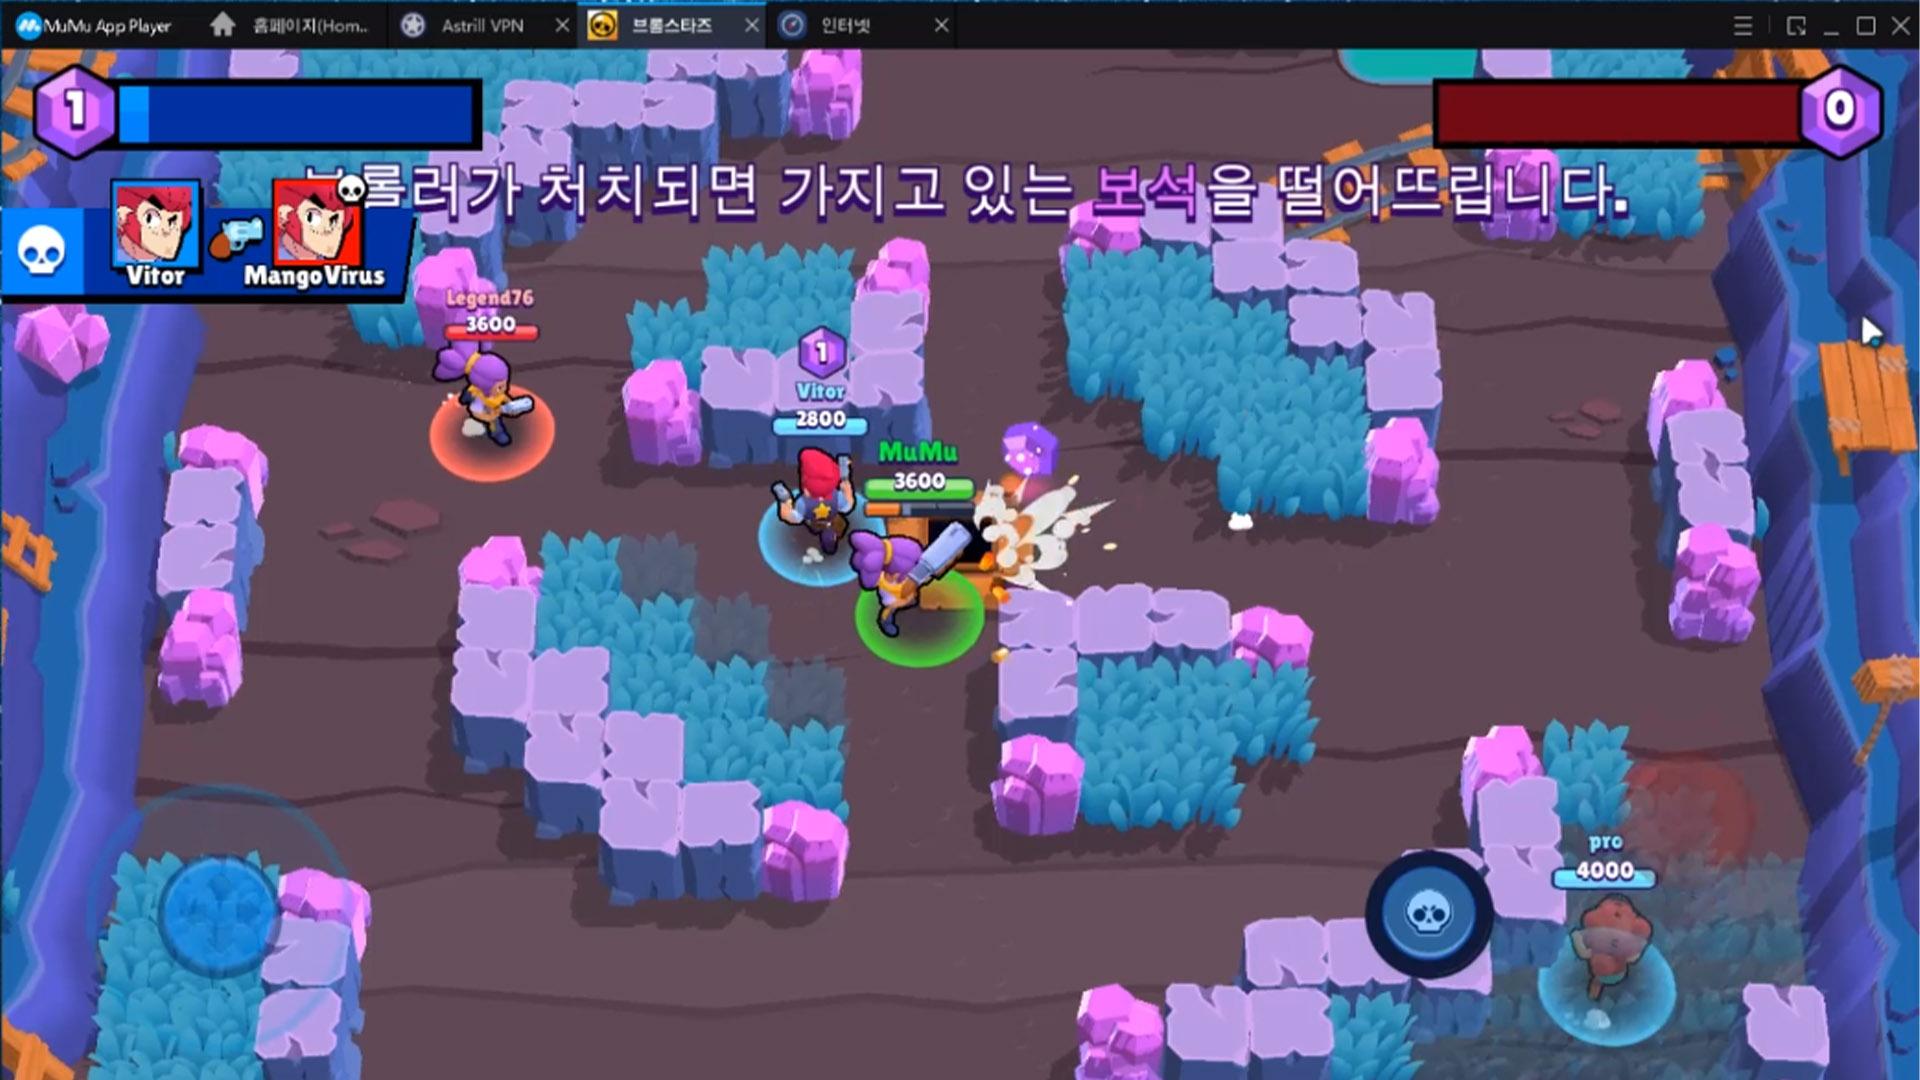 Schermata NetEase MuMu App Player